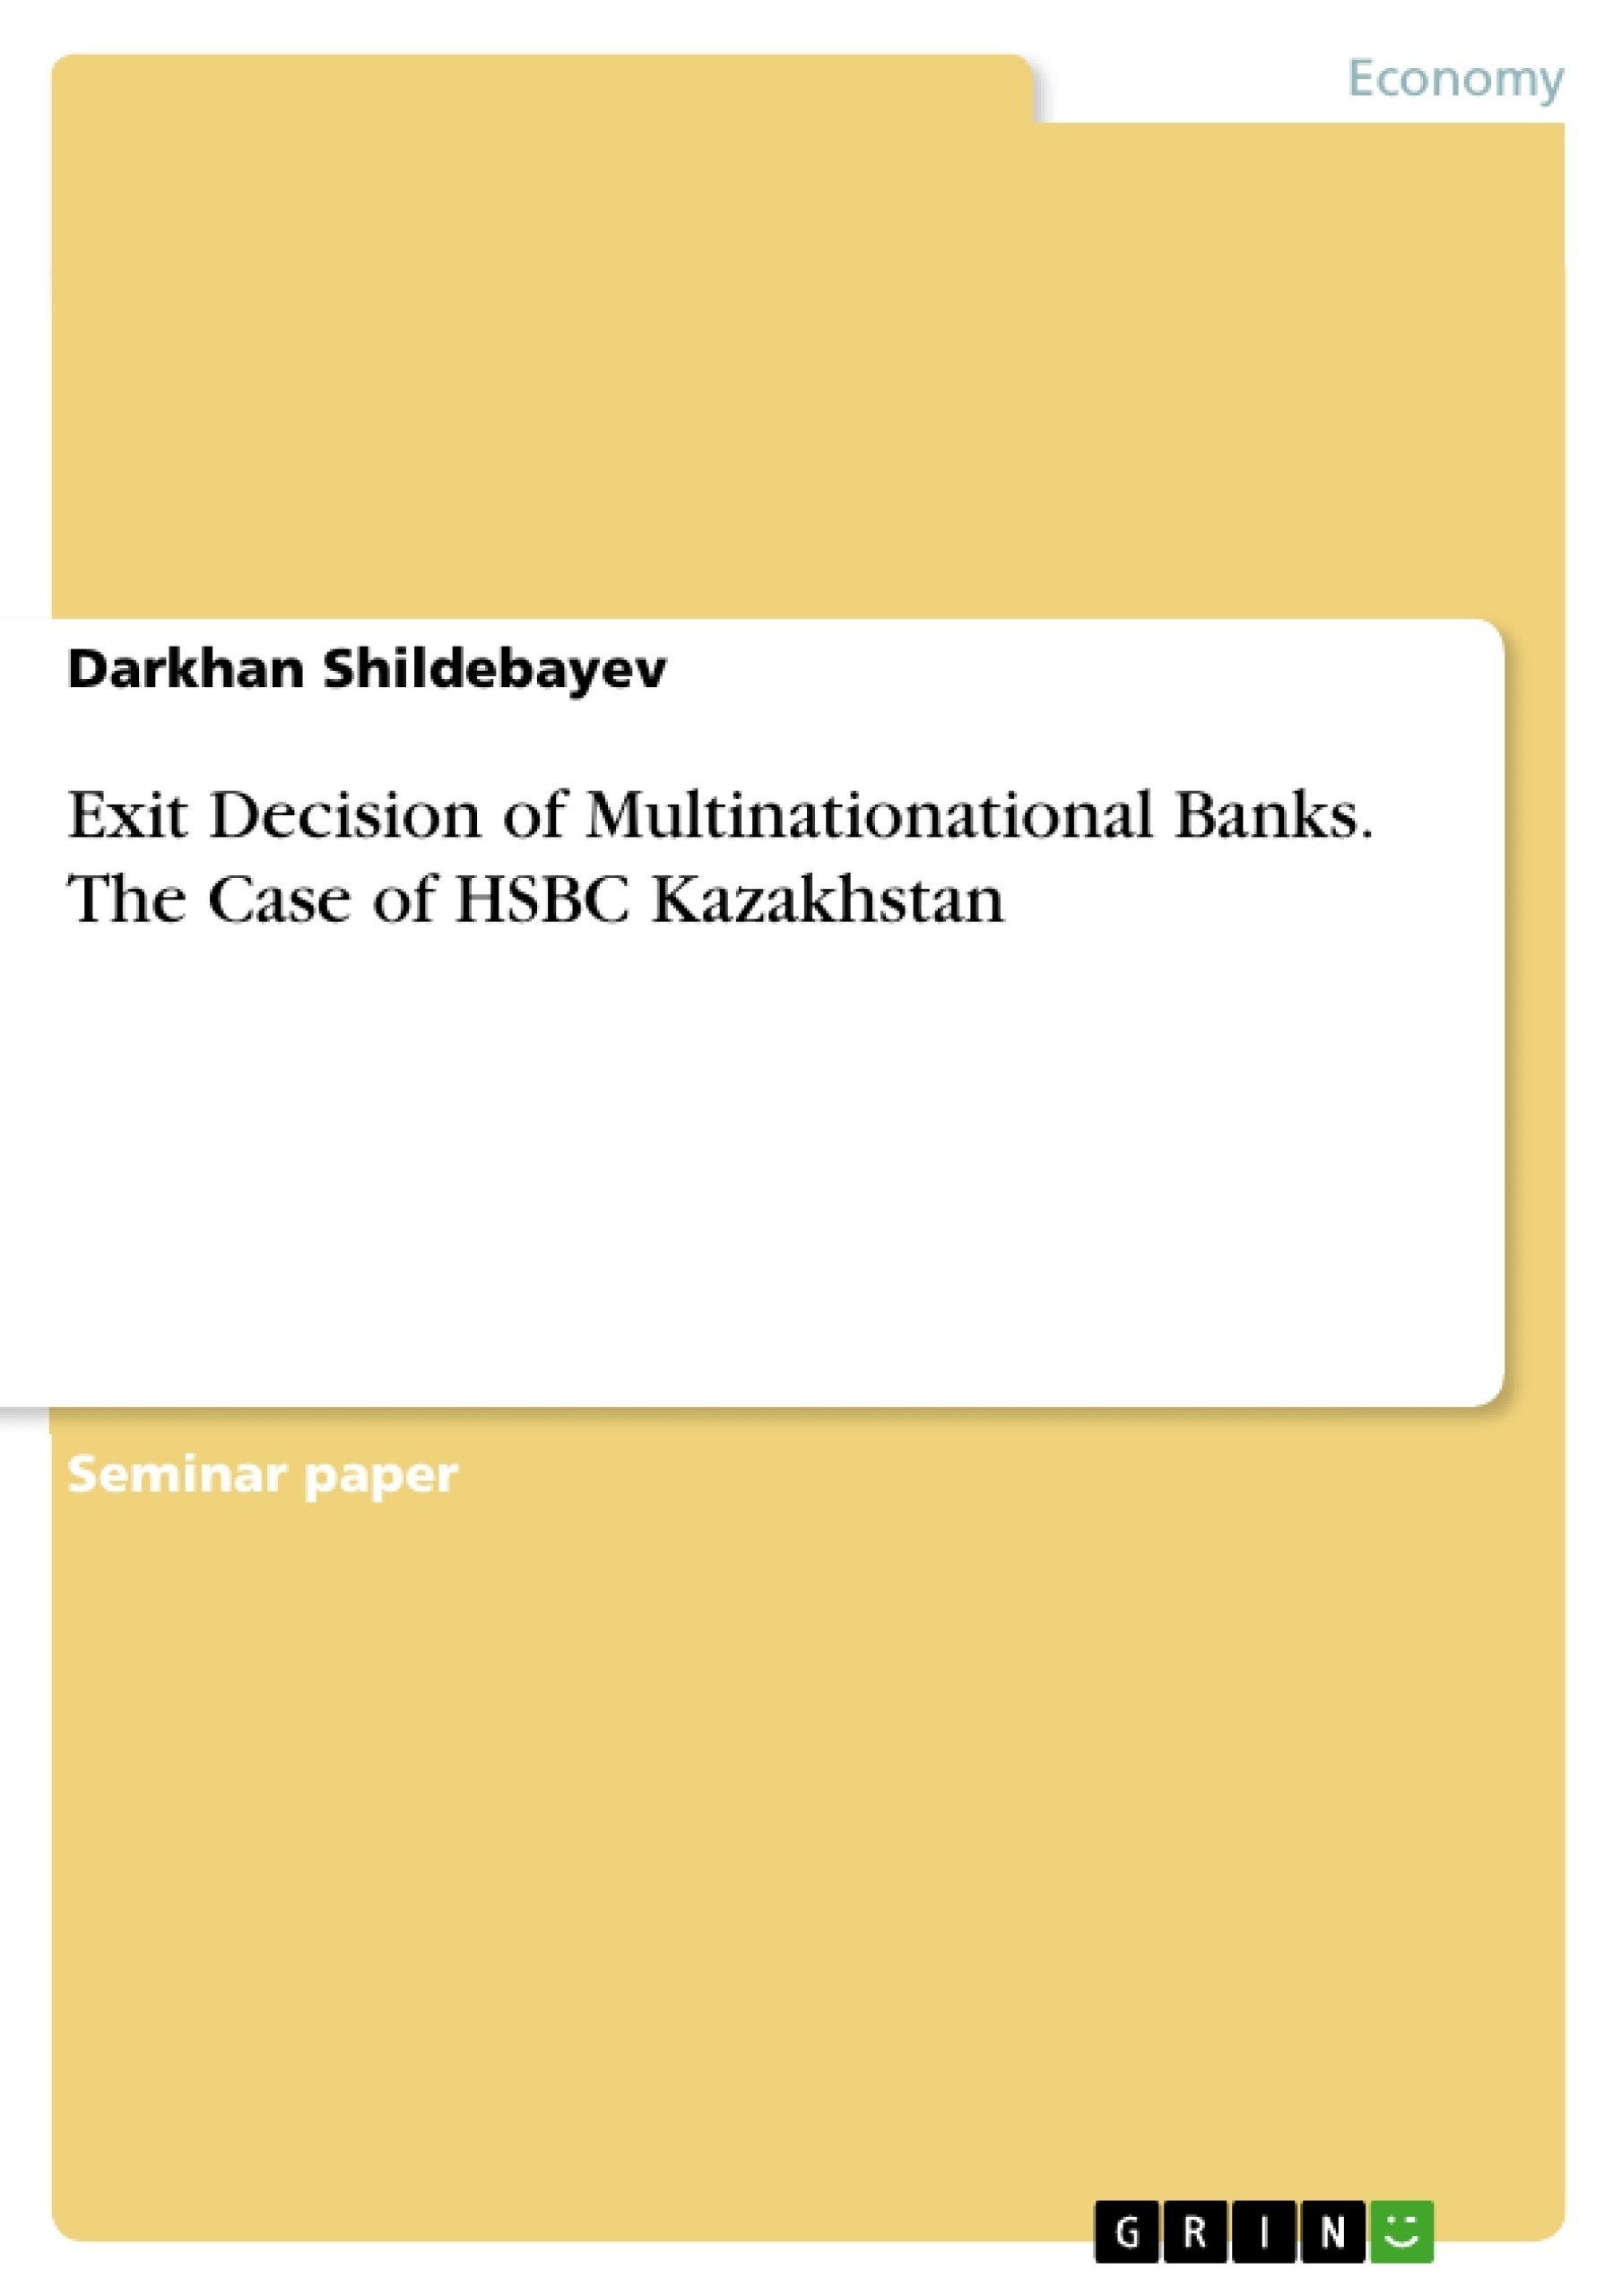 Title: Exit Decision of Multinationational Banks. The Case of HSBC Kazakhstan